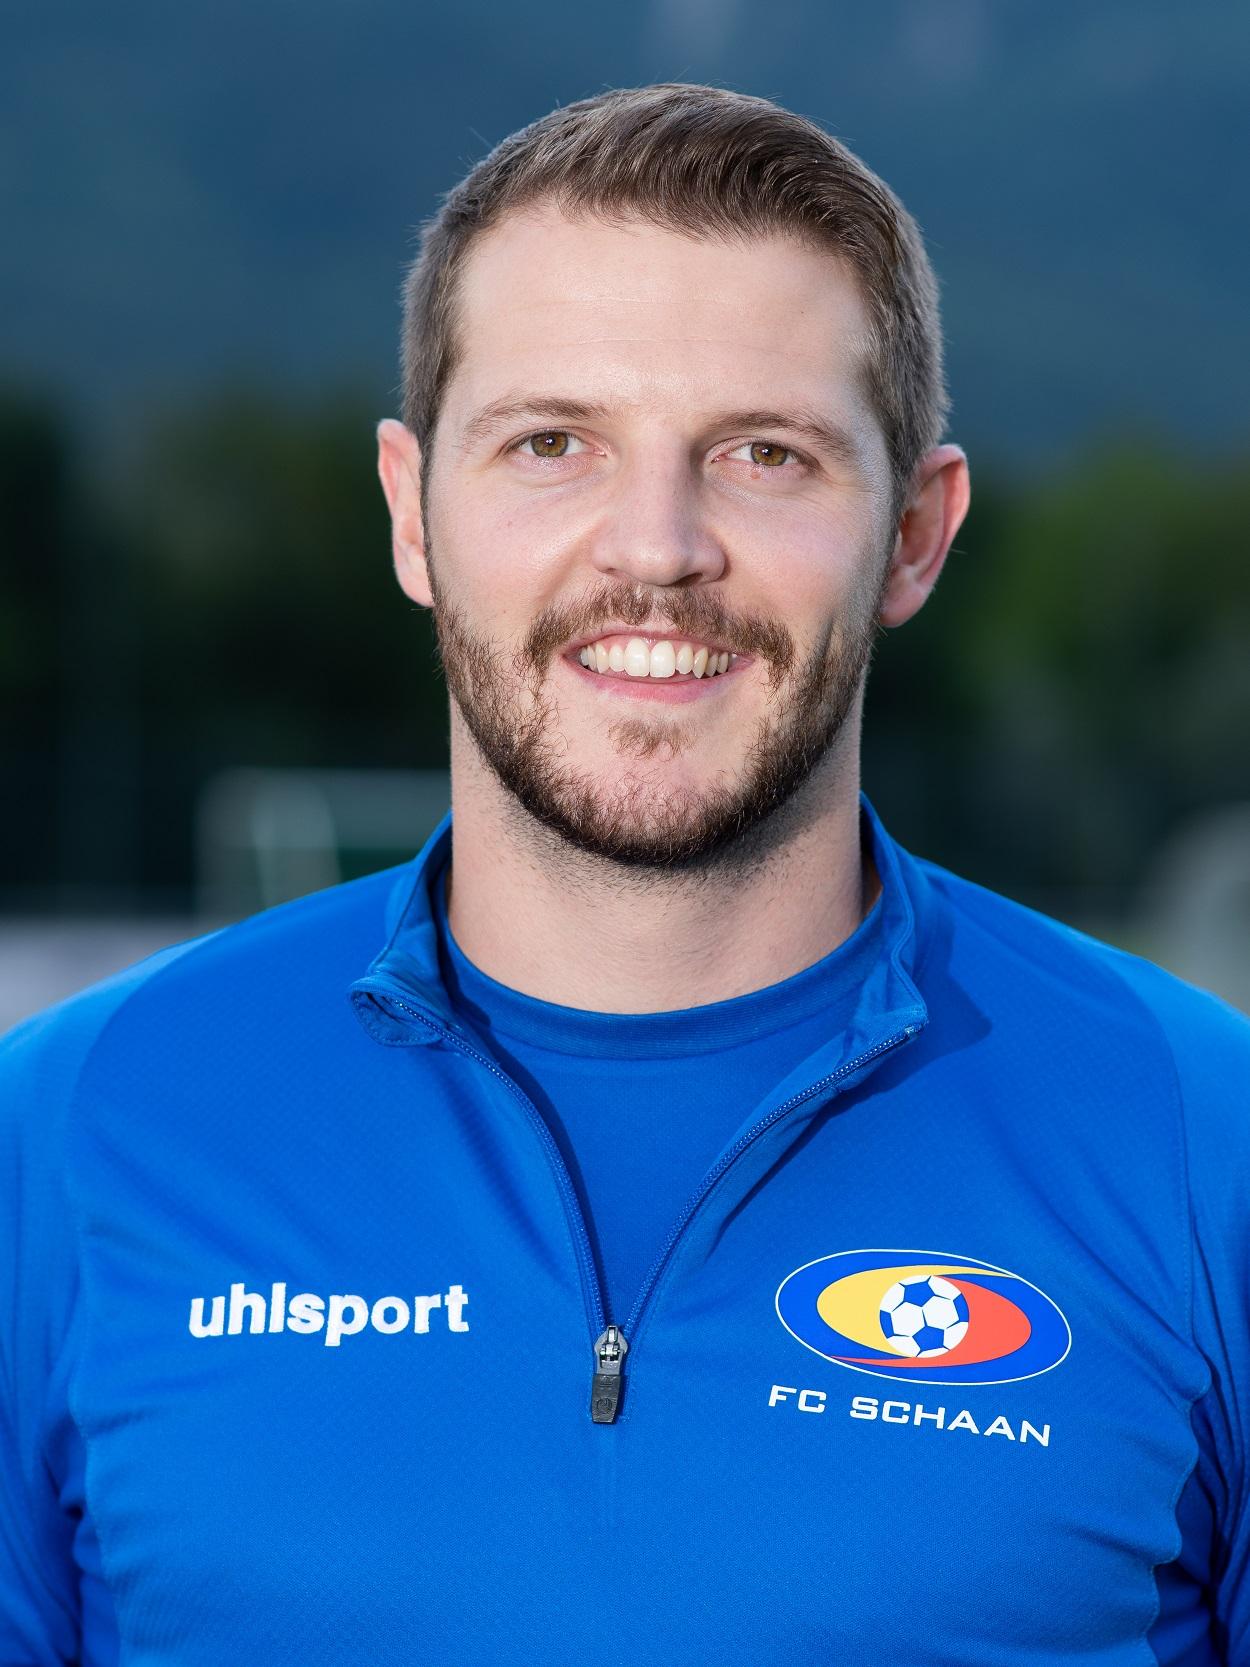 Lucas Eberle